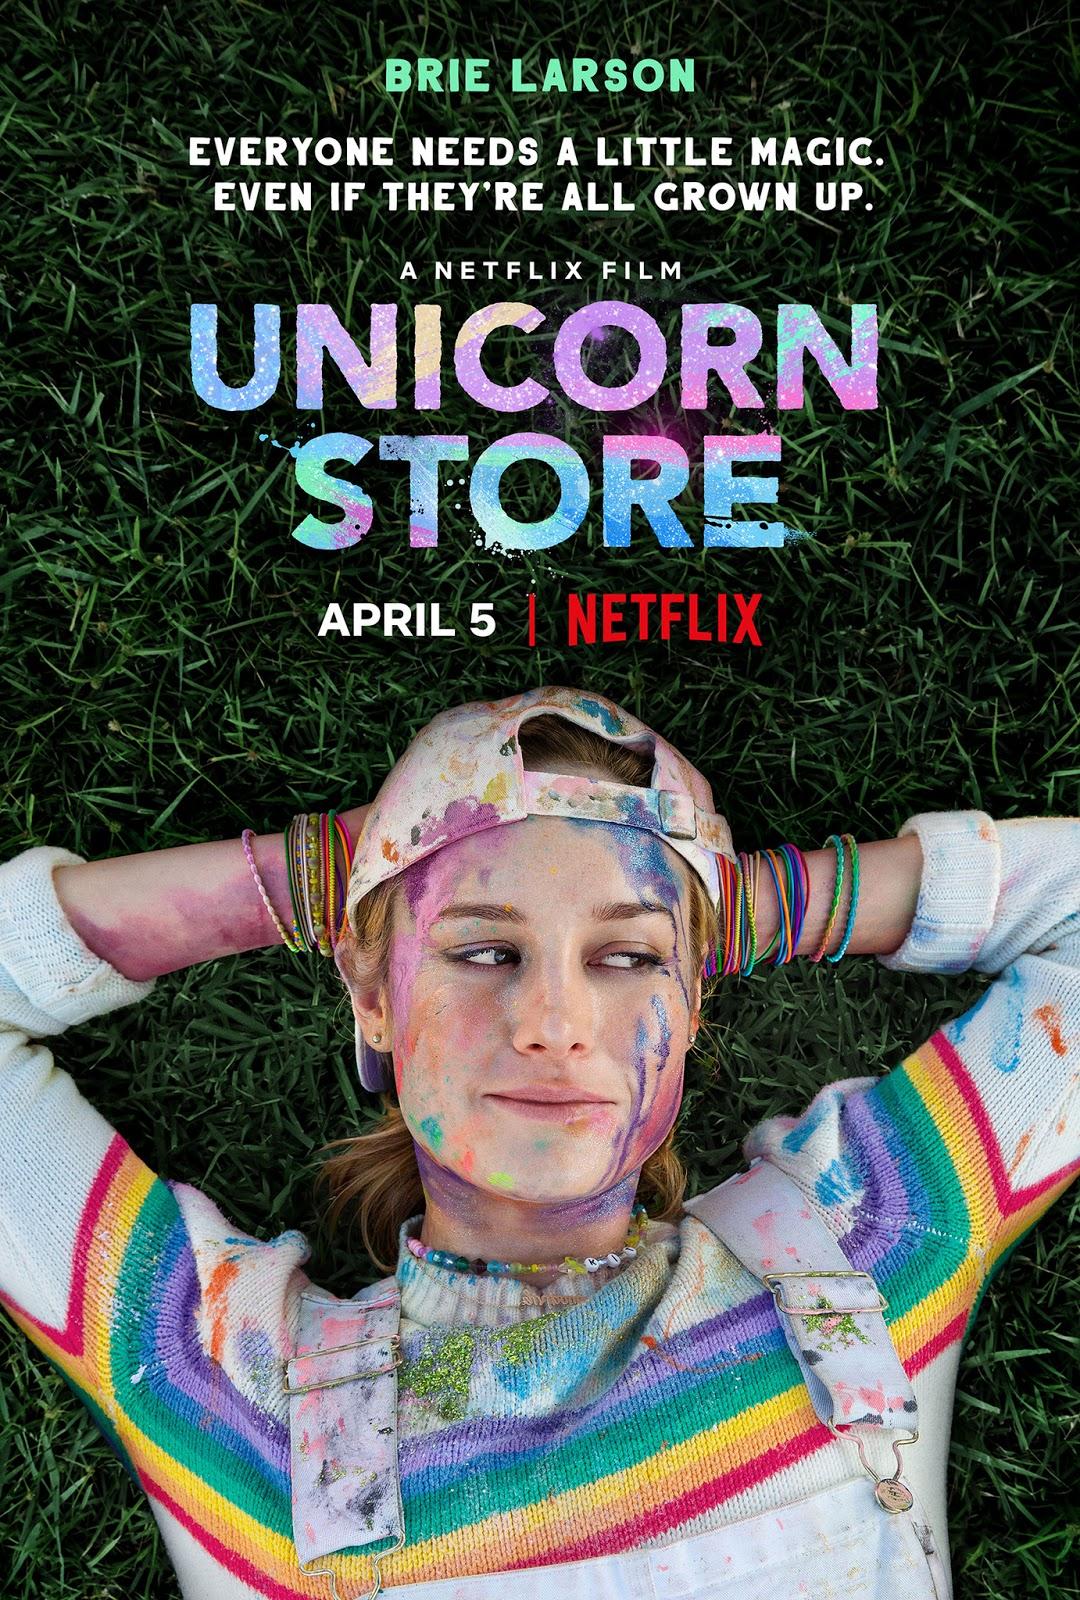 Unicorn Store (2017) ยูนิคอร์นขายฝัน (ซับไทย)